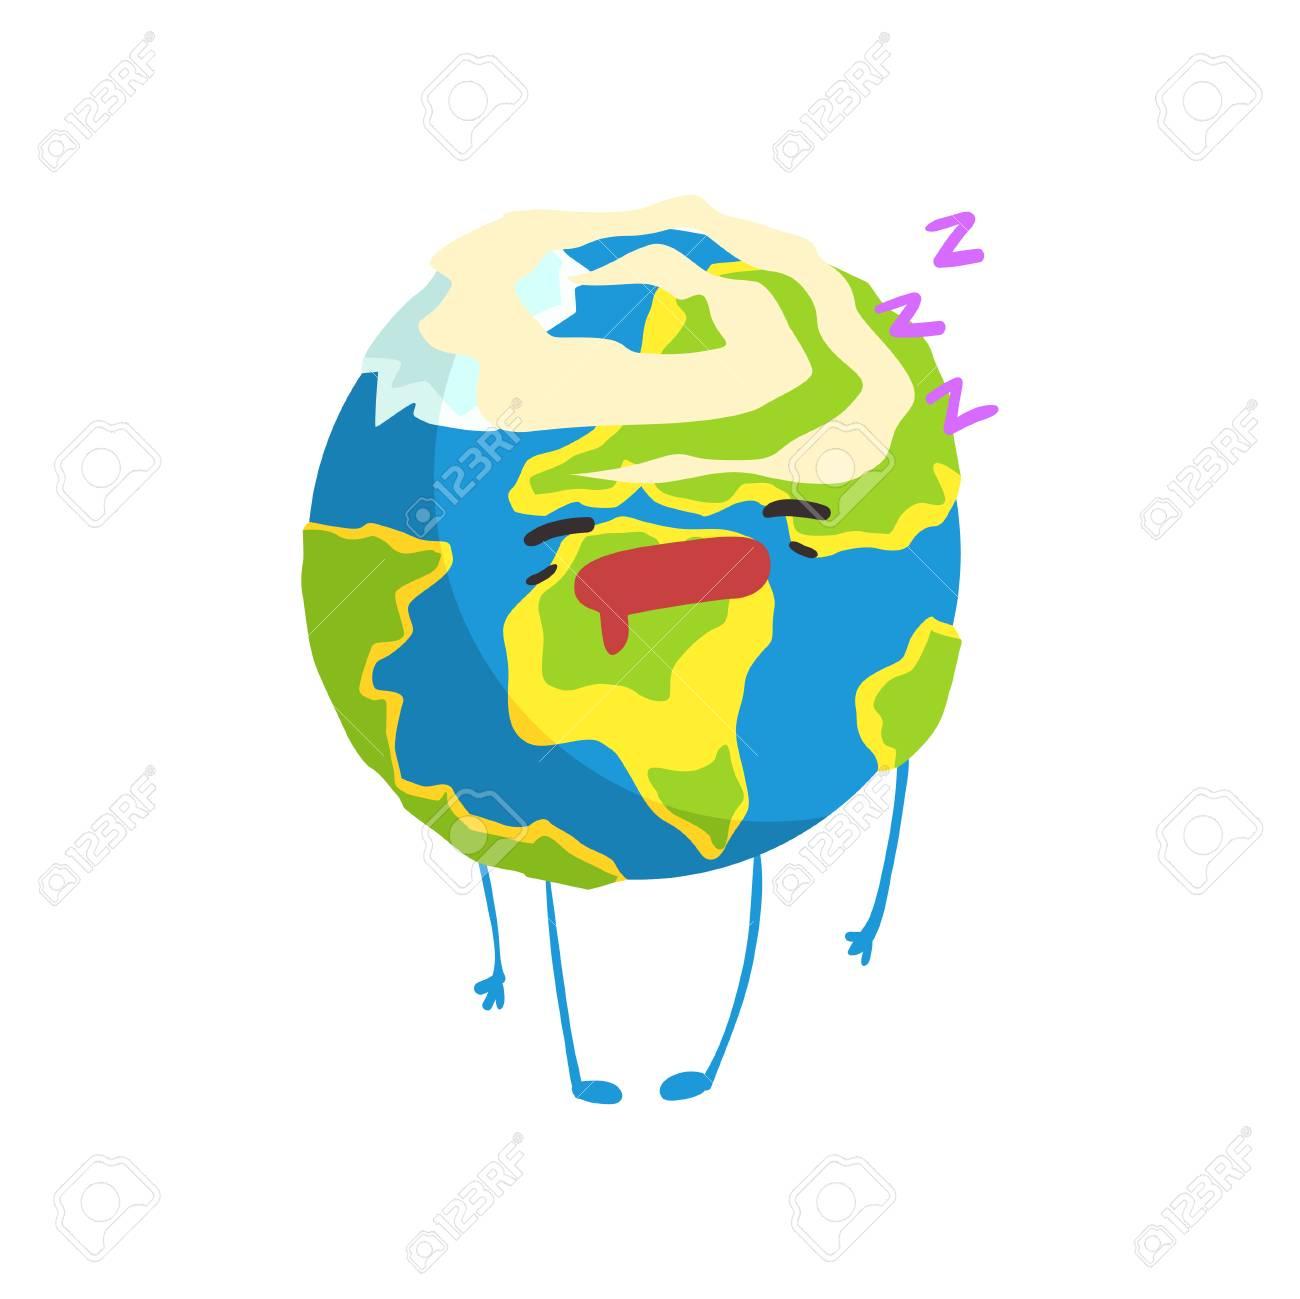 Personnage De Planète Terre Dessin Animé Mignon Dormant, Drôle Emoji Globe  Vector Illustration serapportantà Image De La Terre Dessin